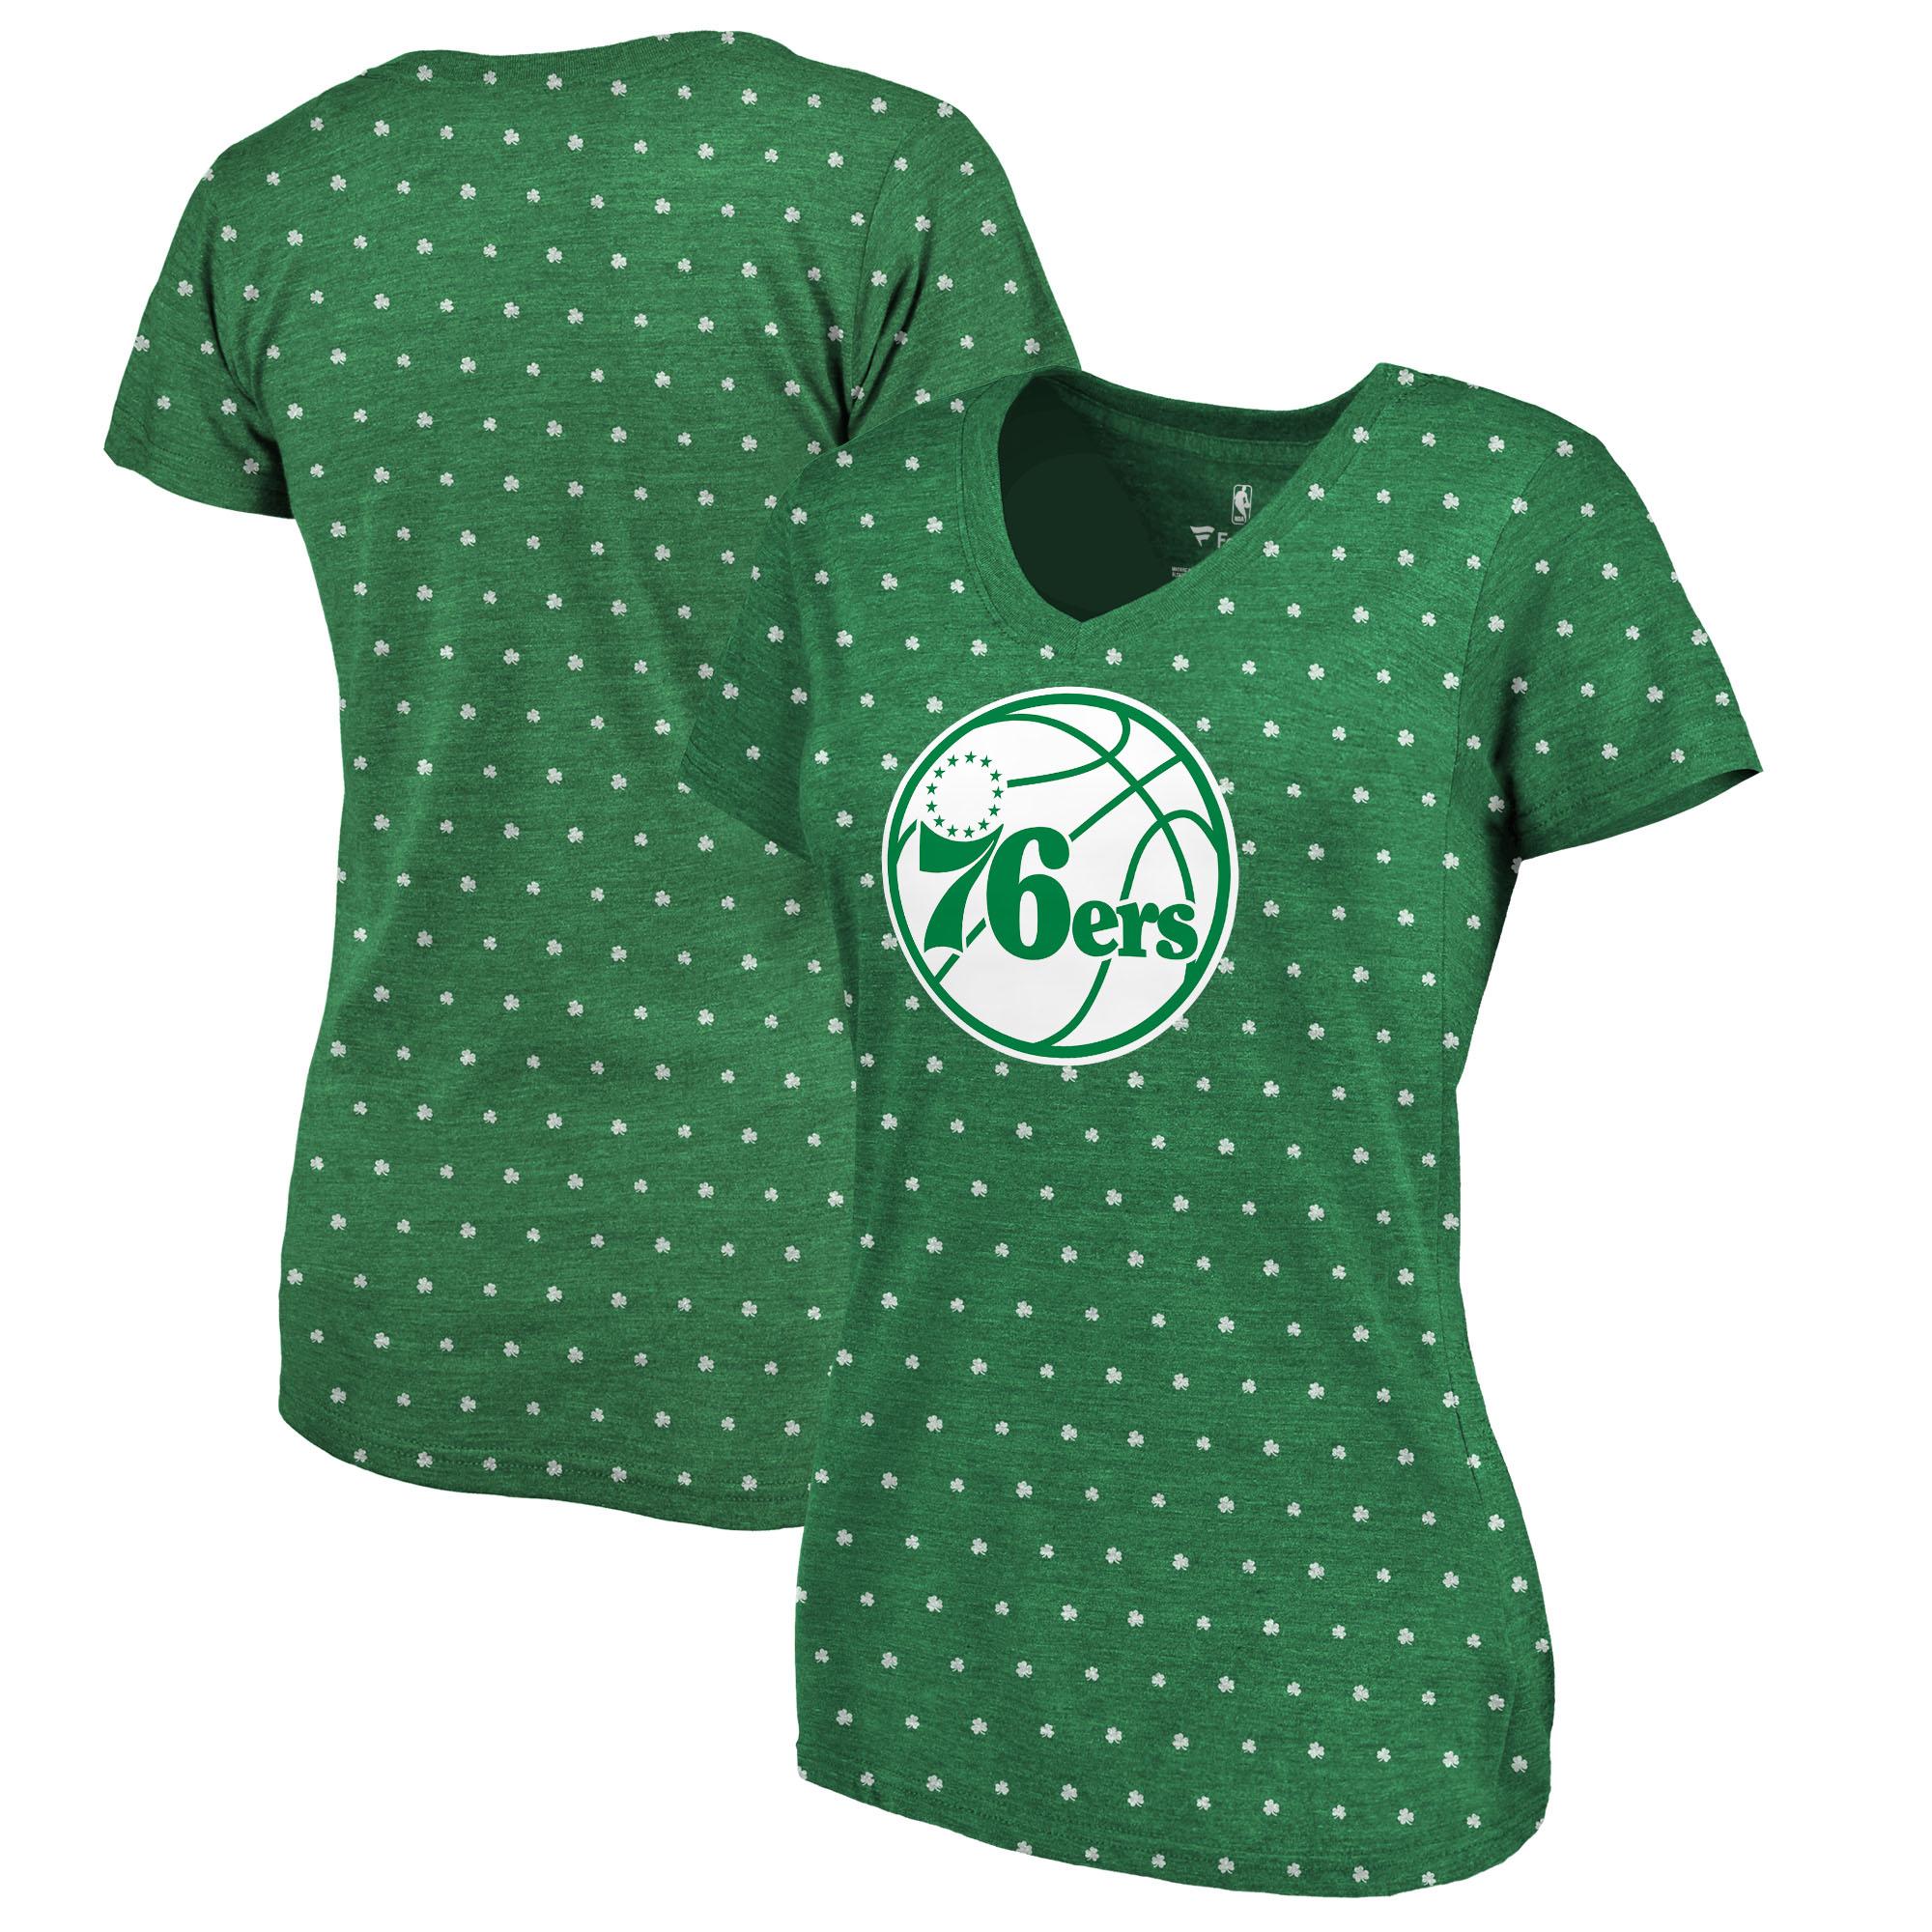 Philadelphia 76ers Fanatics Branded Women's All Irish All Over Print V-Neck T-Shirt - Kelly Green